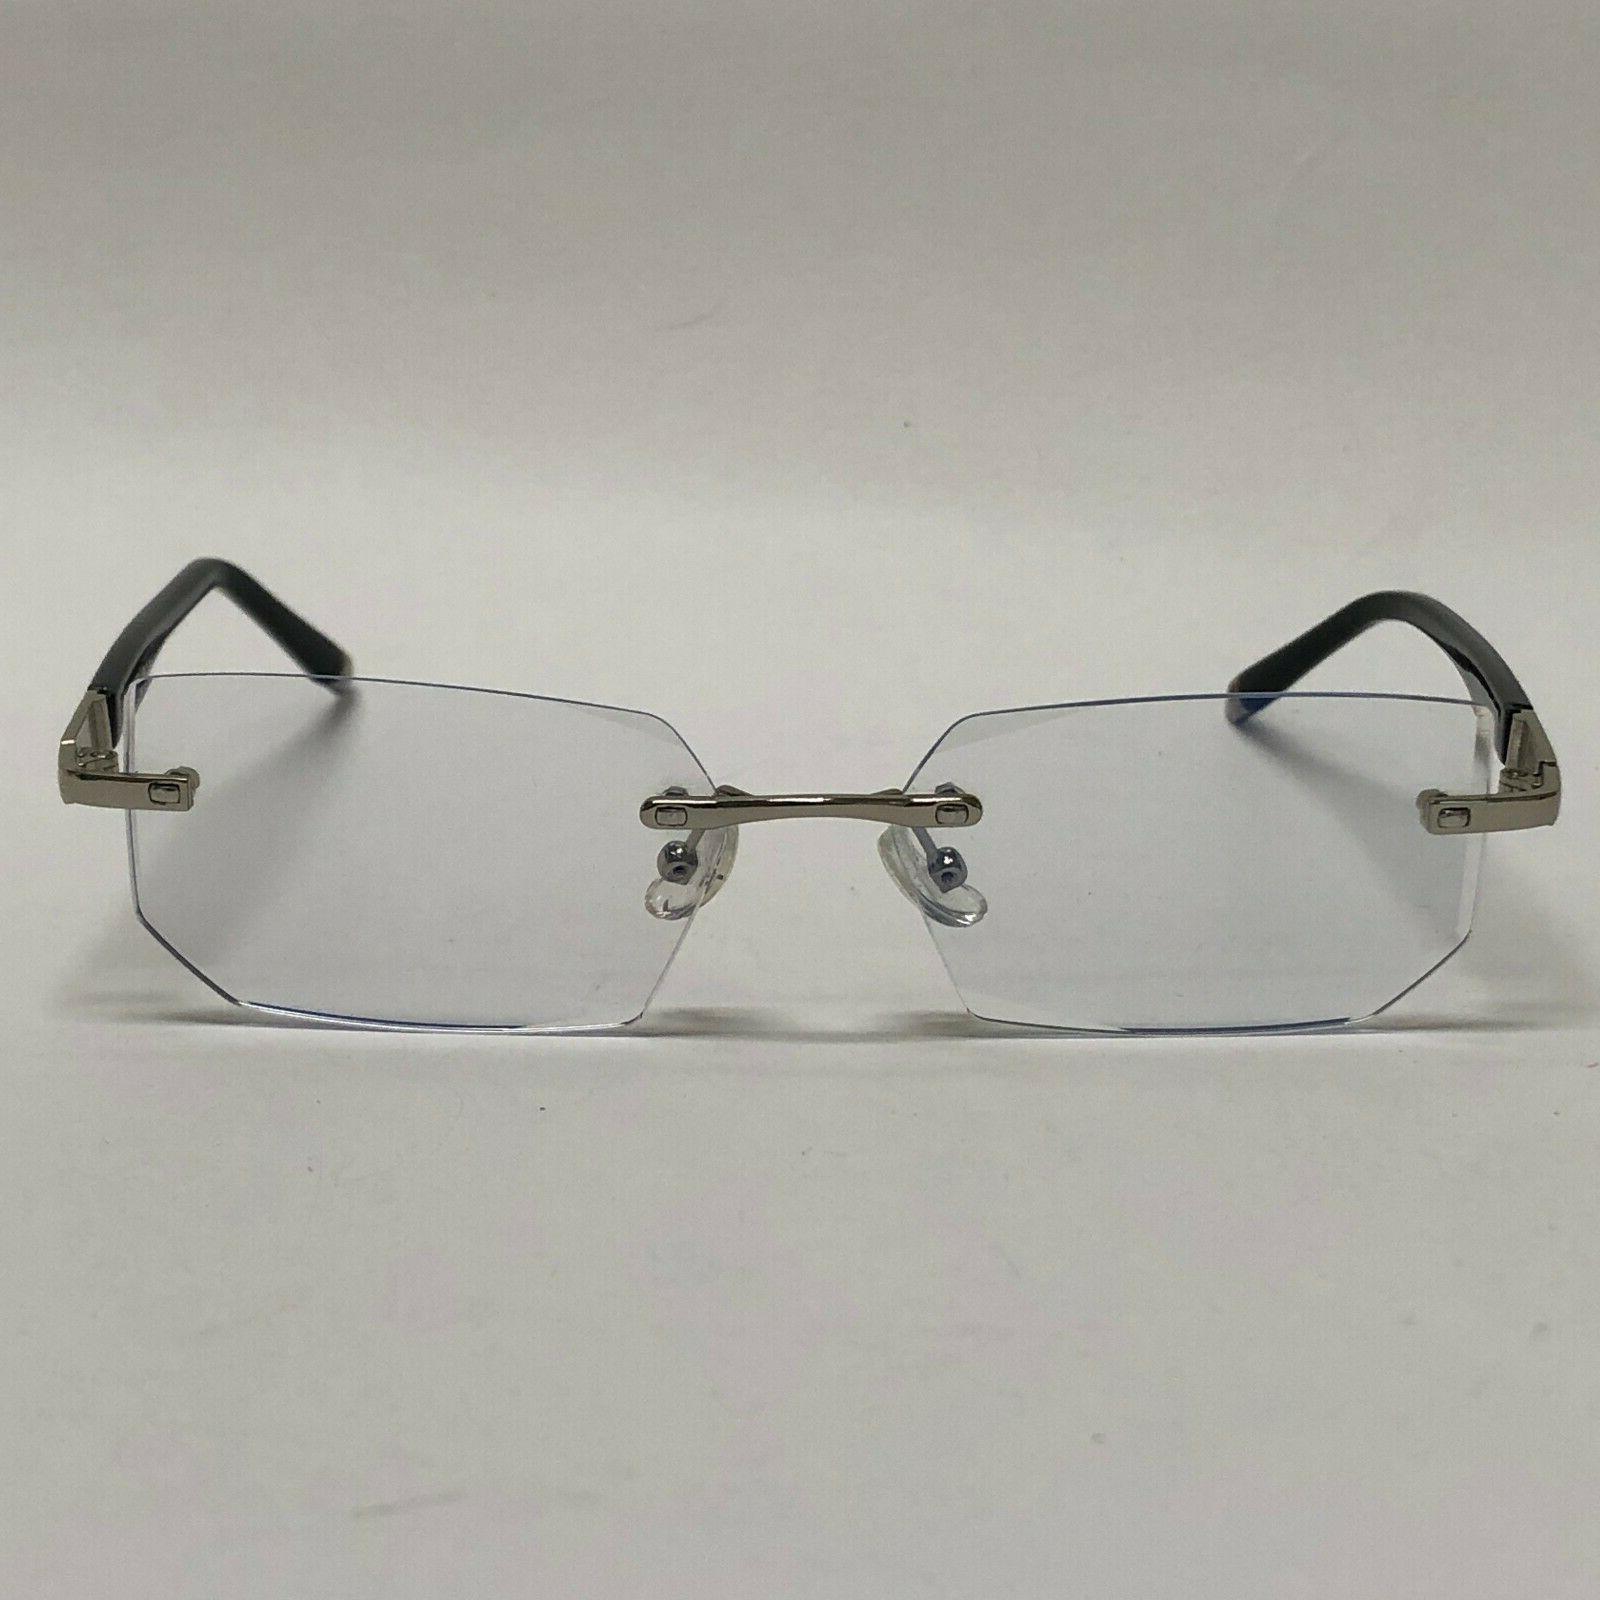 Mens Glasses Lens Rimless Small Reflective Square Silver